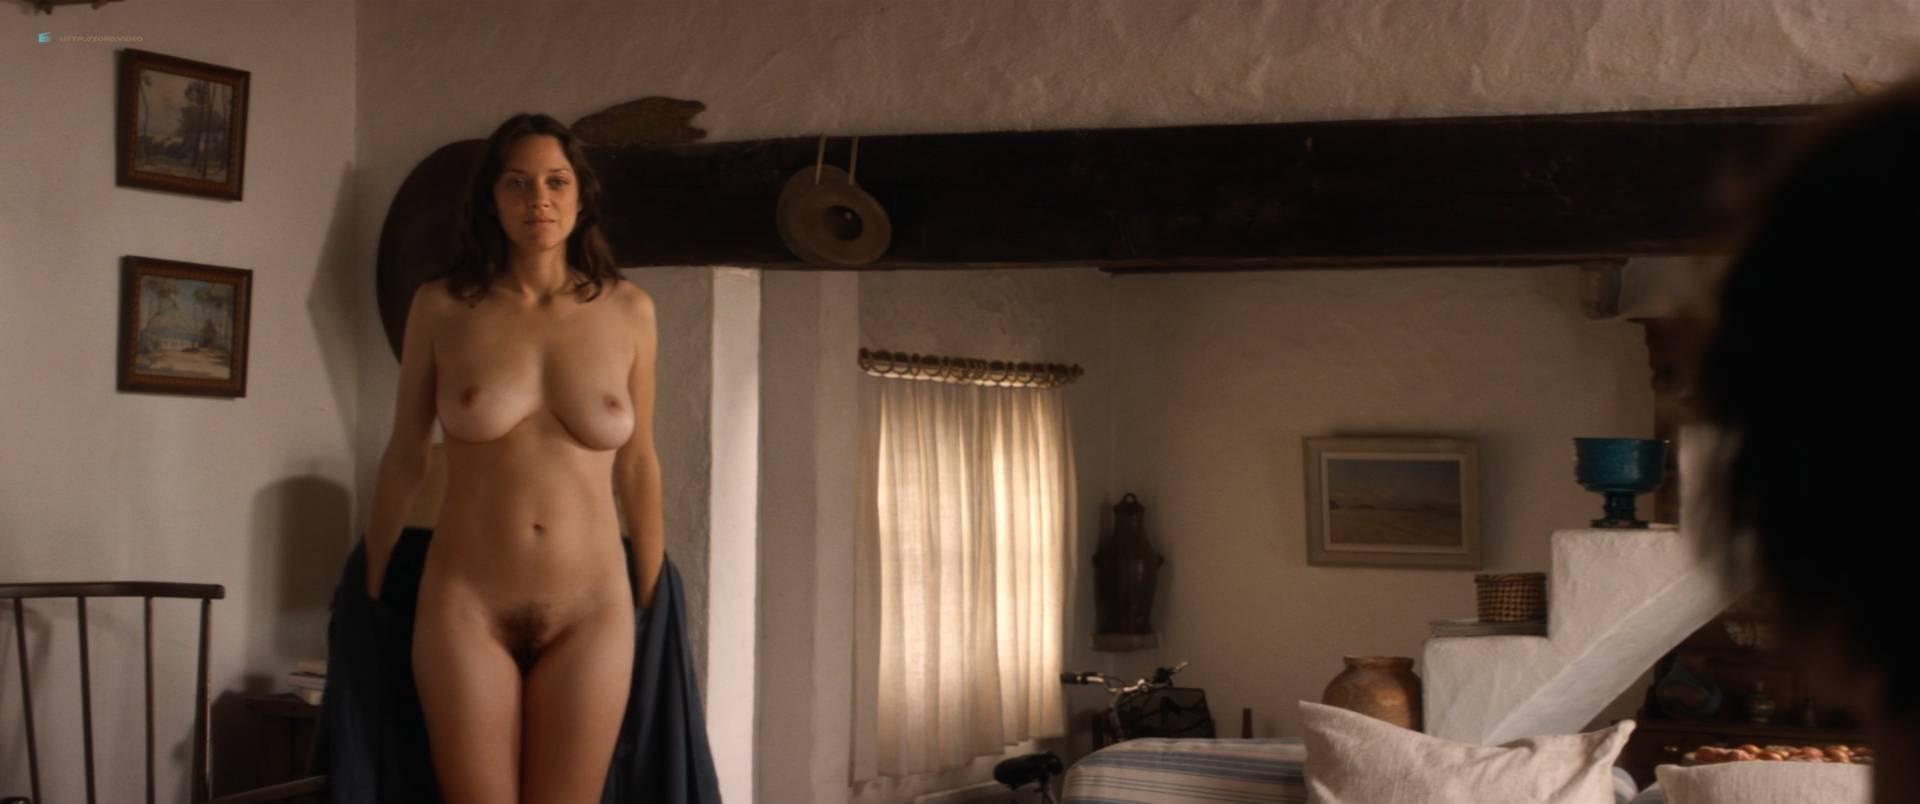 Marion-Cotillard-nude-full-frontal-Alba-Rohrwacher-nude-nipple-Les-fantomes-d_Ismael-FR-2017-HD-1080p-BluRay-006.jpg